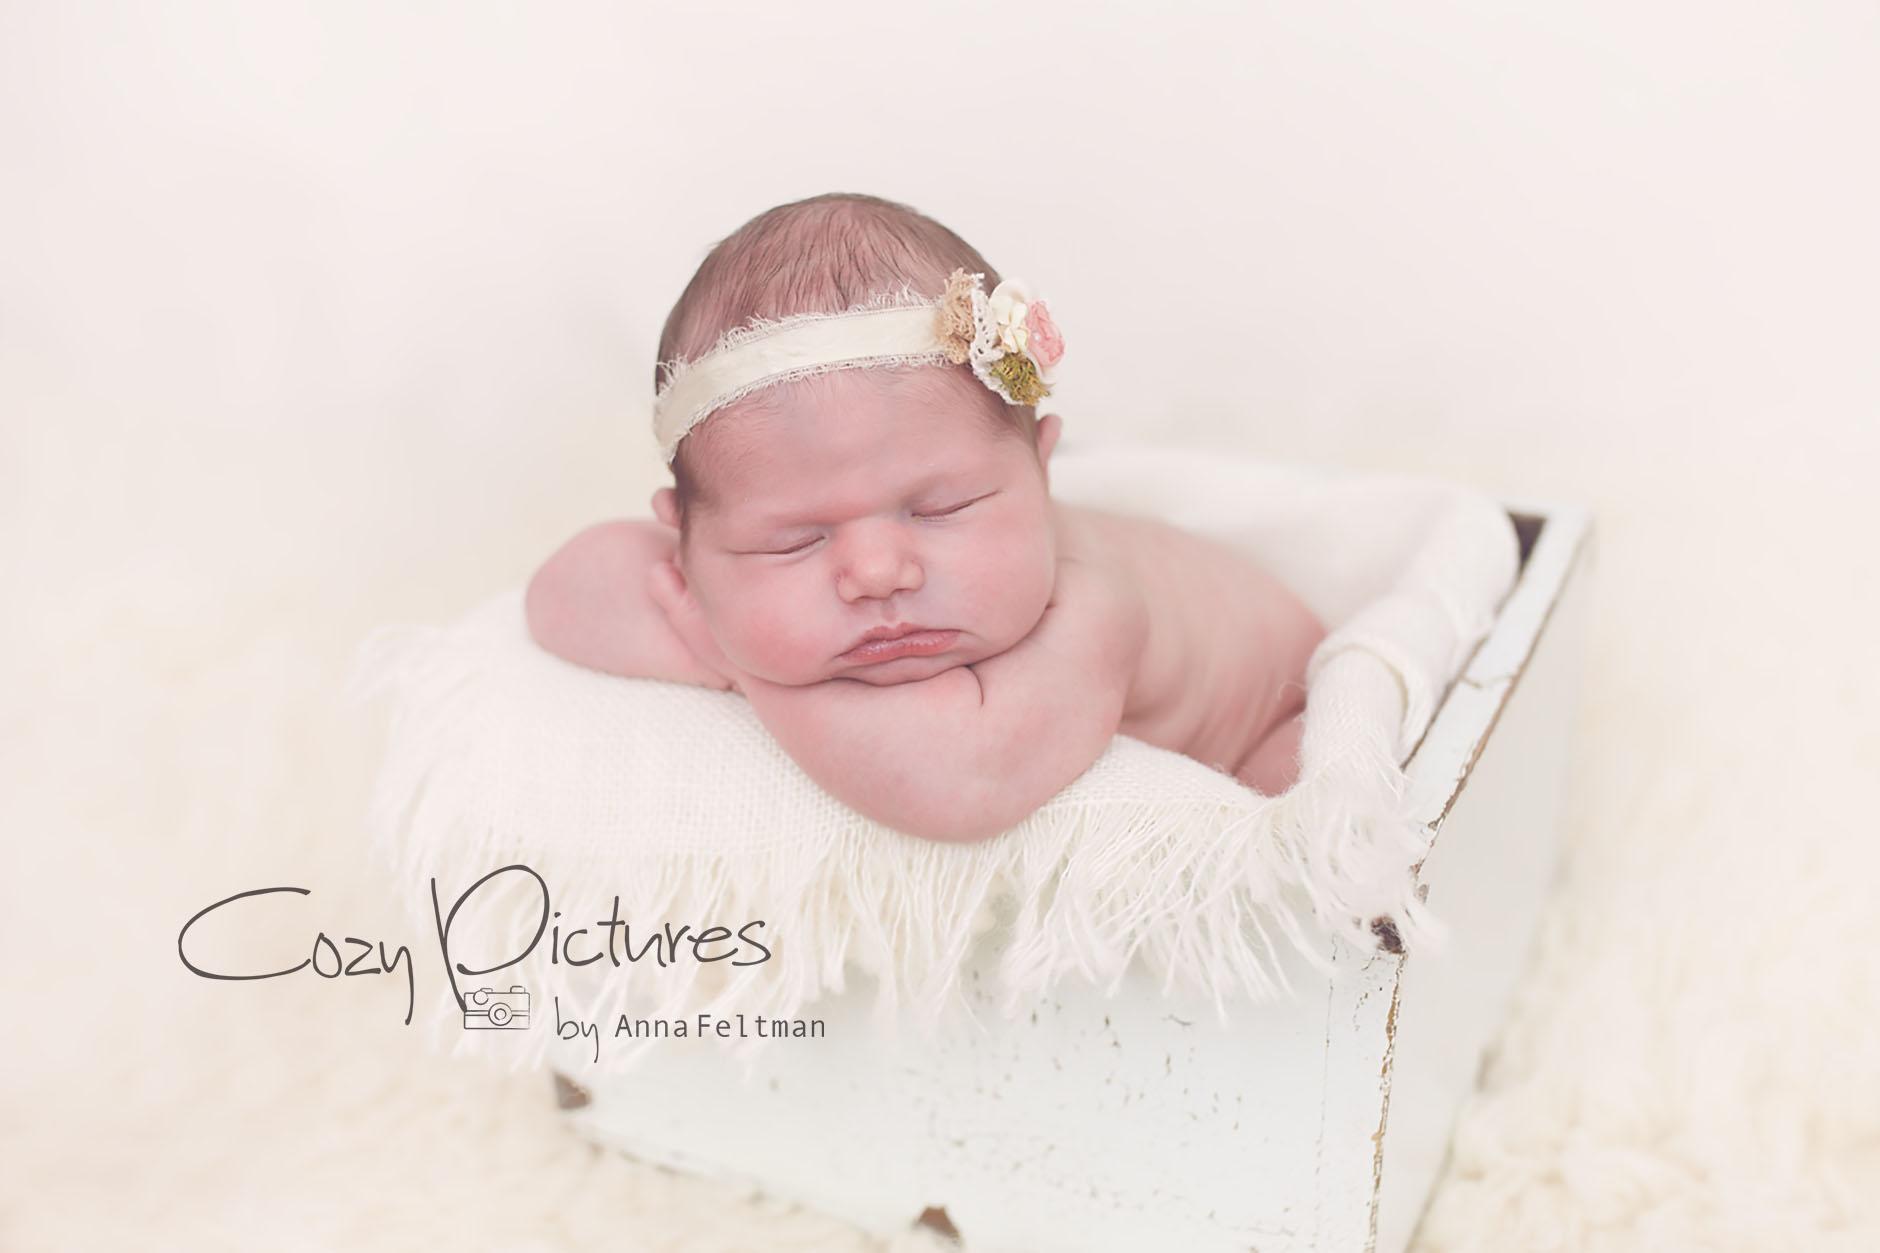 Newborn_Orlando_10_cozy_pictures.jpg